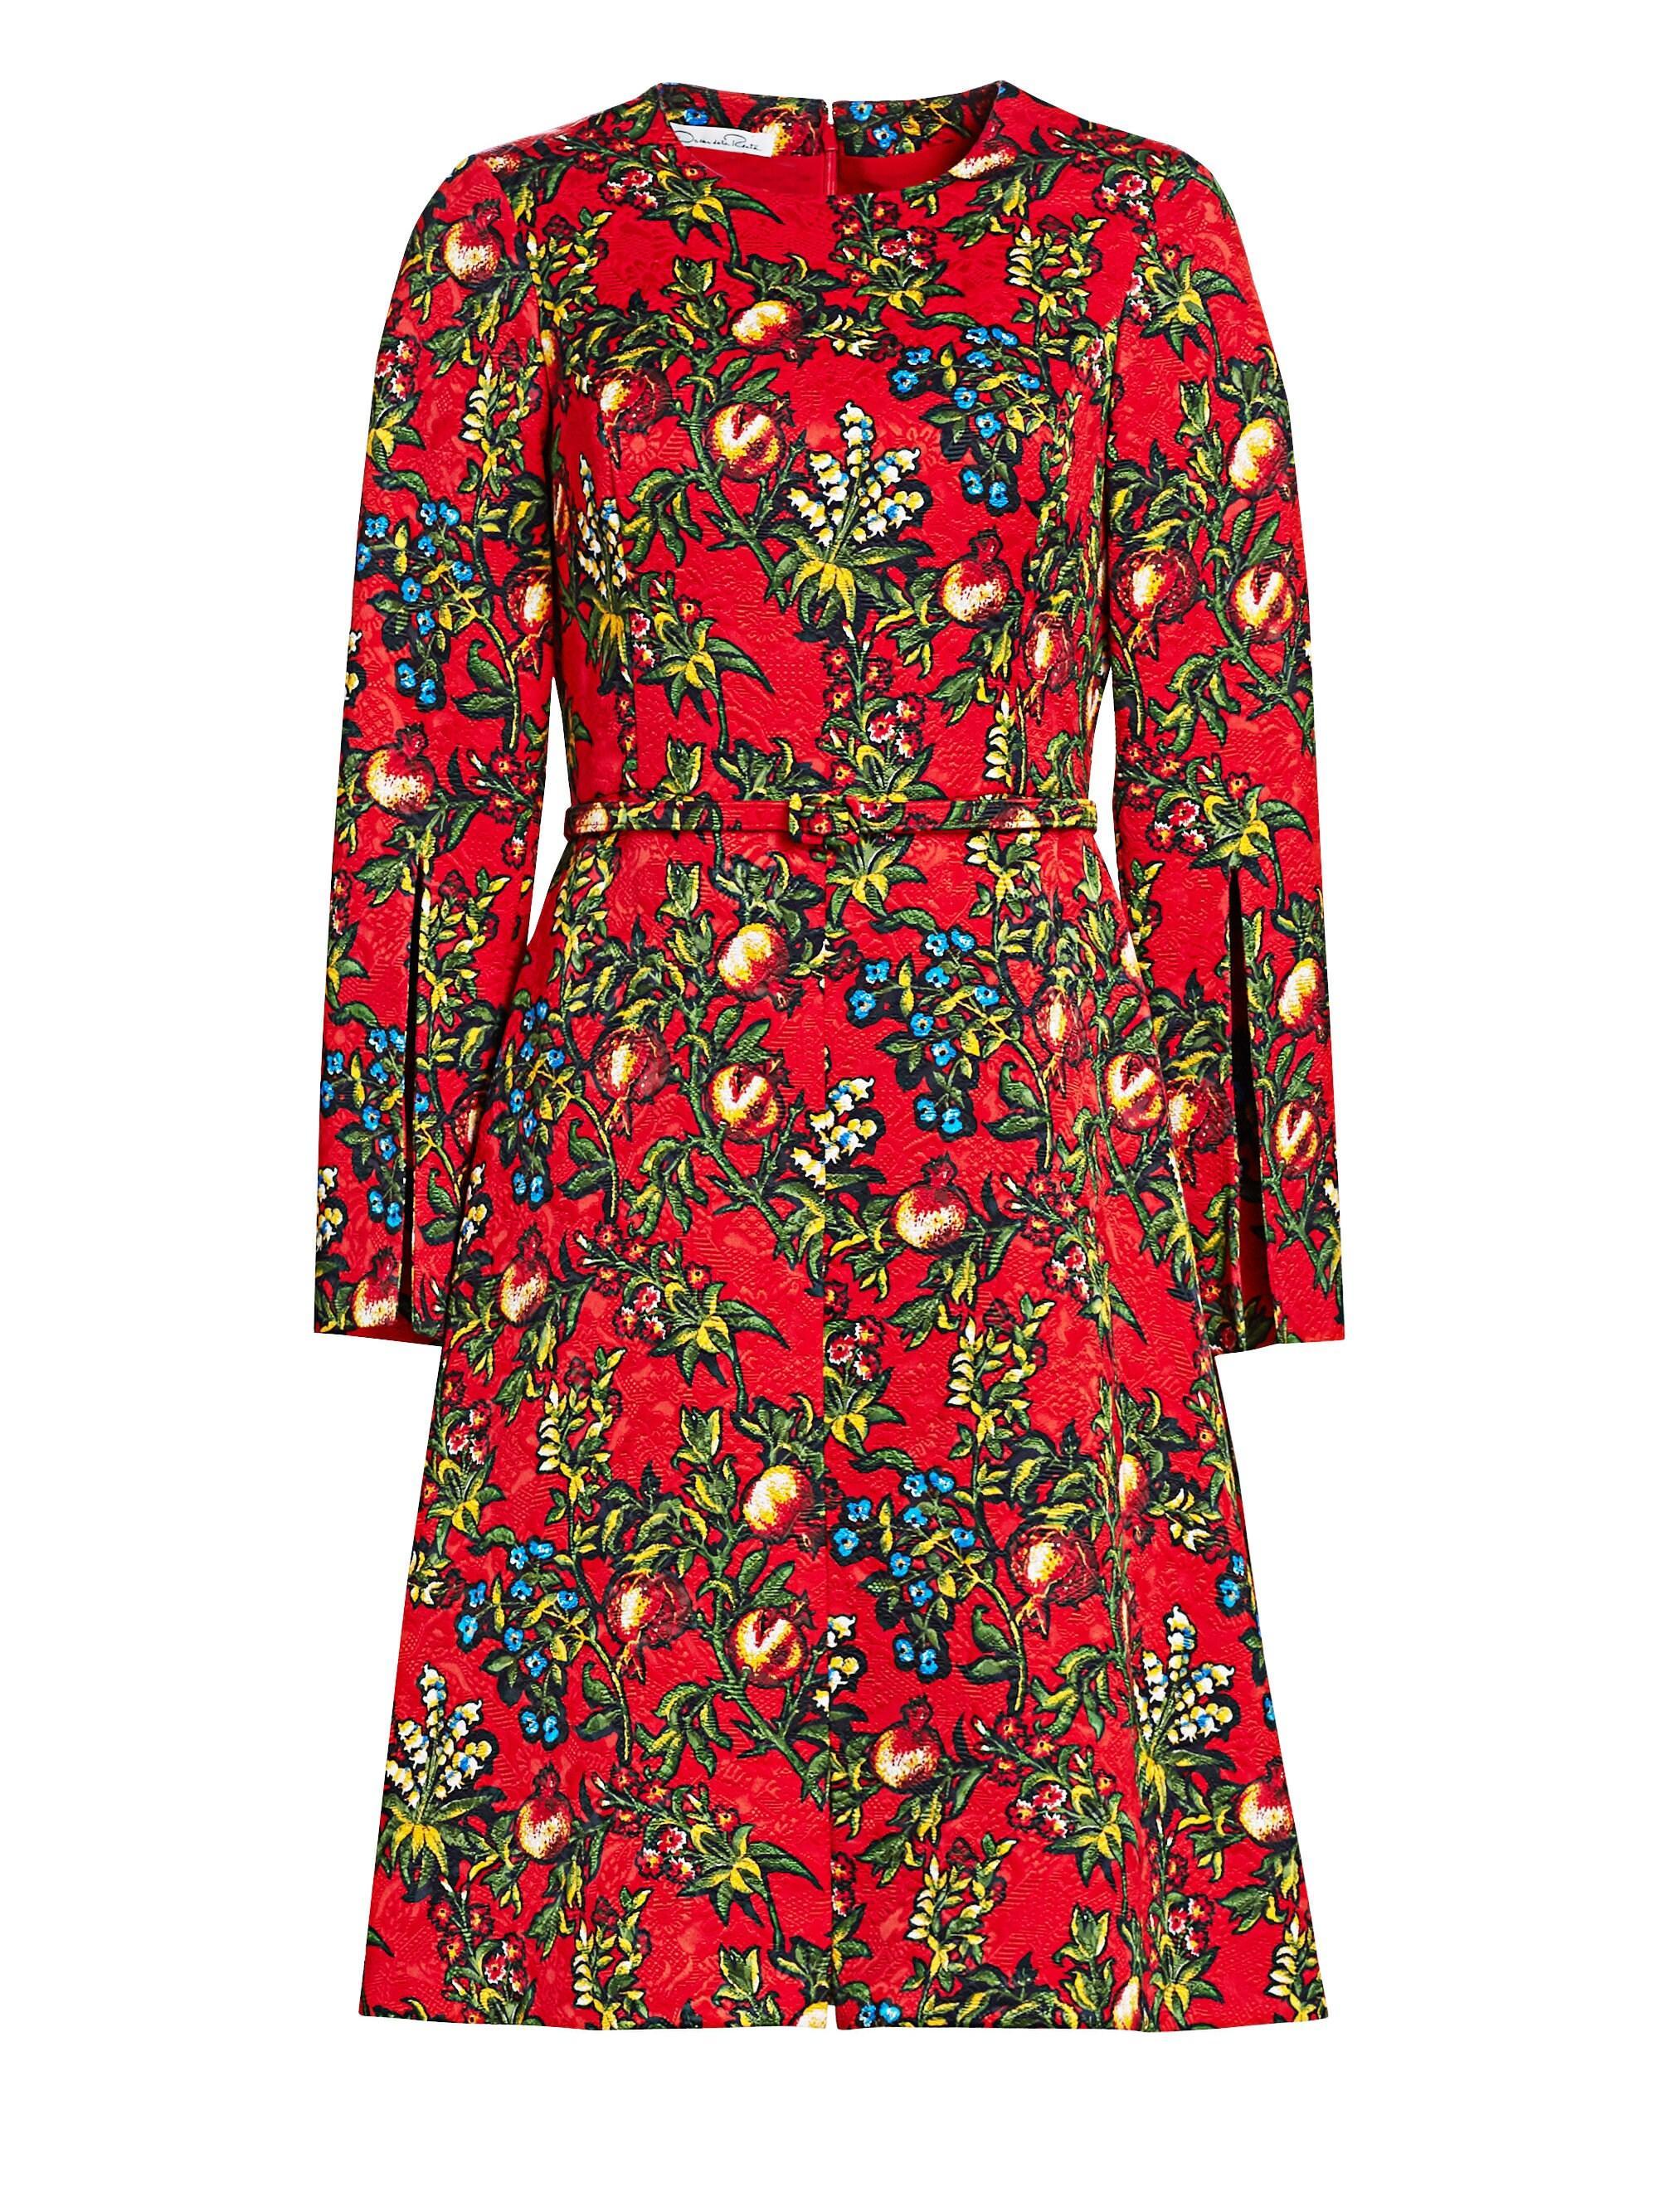 d4a2e934dbebbd Oscar de la Renta Pomegranate Jacquard A-line Dress in Black - Lyst